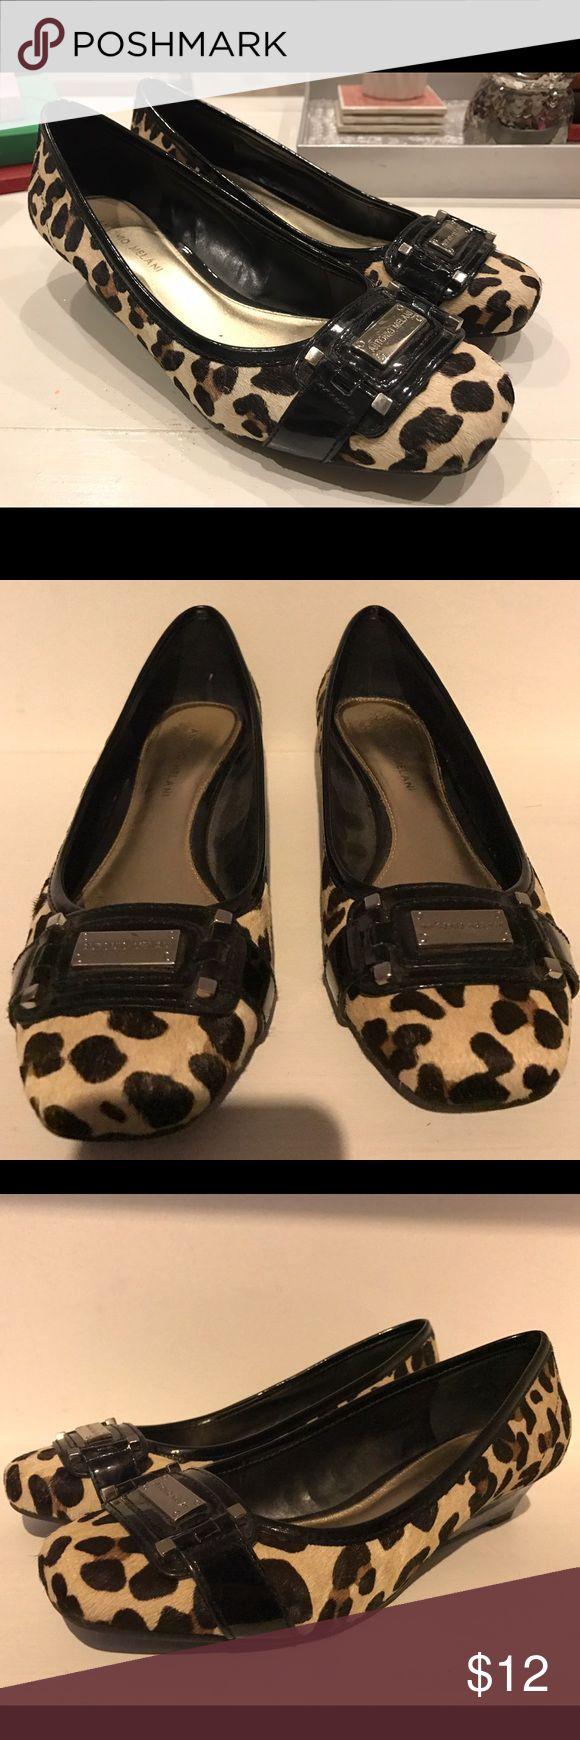 Antonio Melani animal print flats Great shoes. So comfortable. ANTONIO MELANI Shoes Flats & Loafers